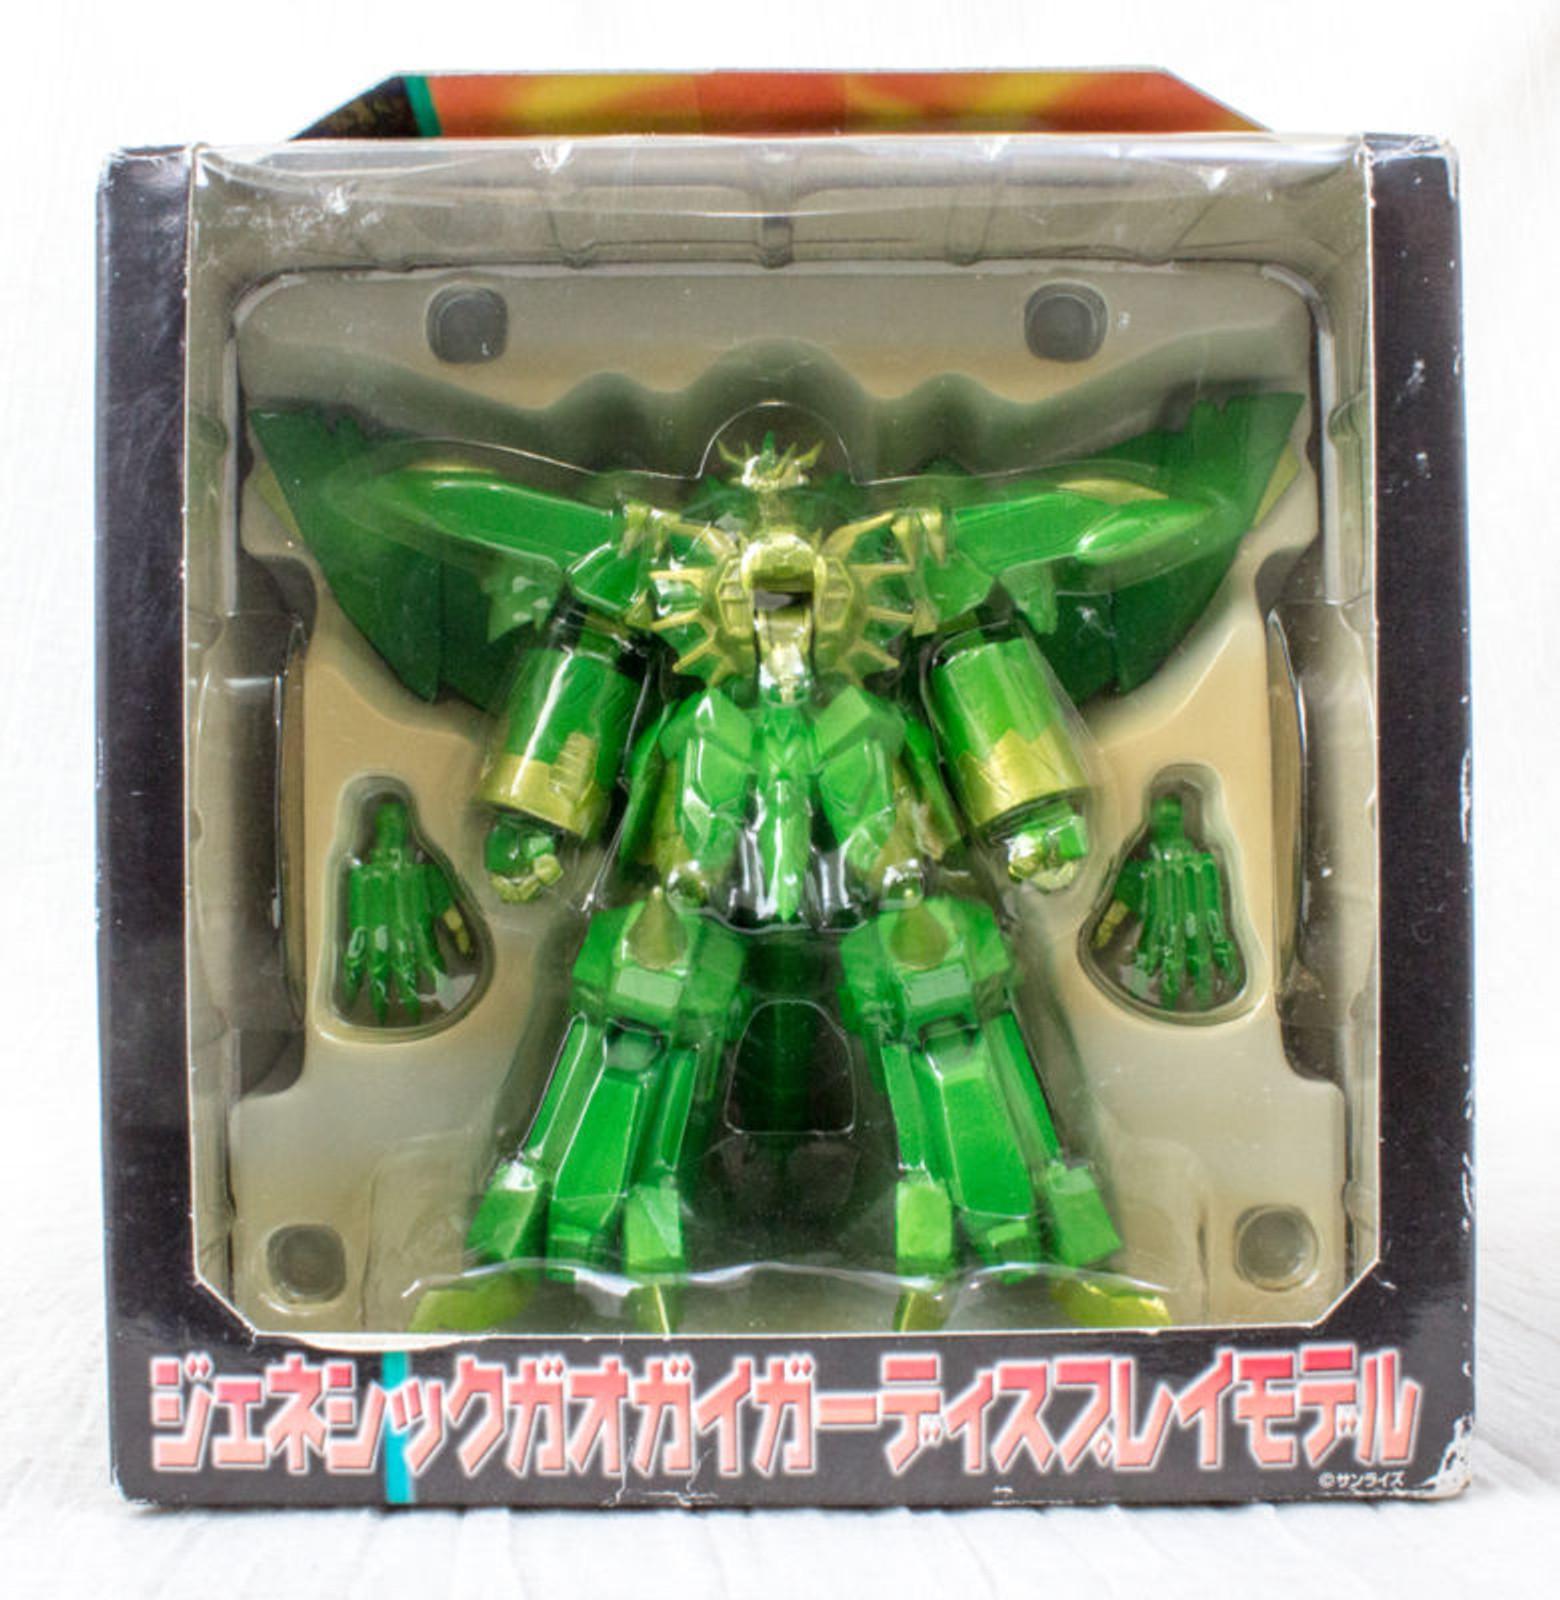 Genesic Gaogaigar Final Display Model Figure Green Color JAPAN ANIME MANGA